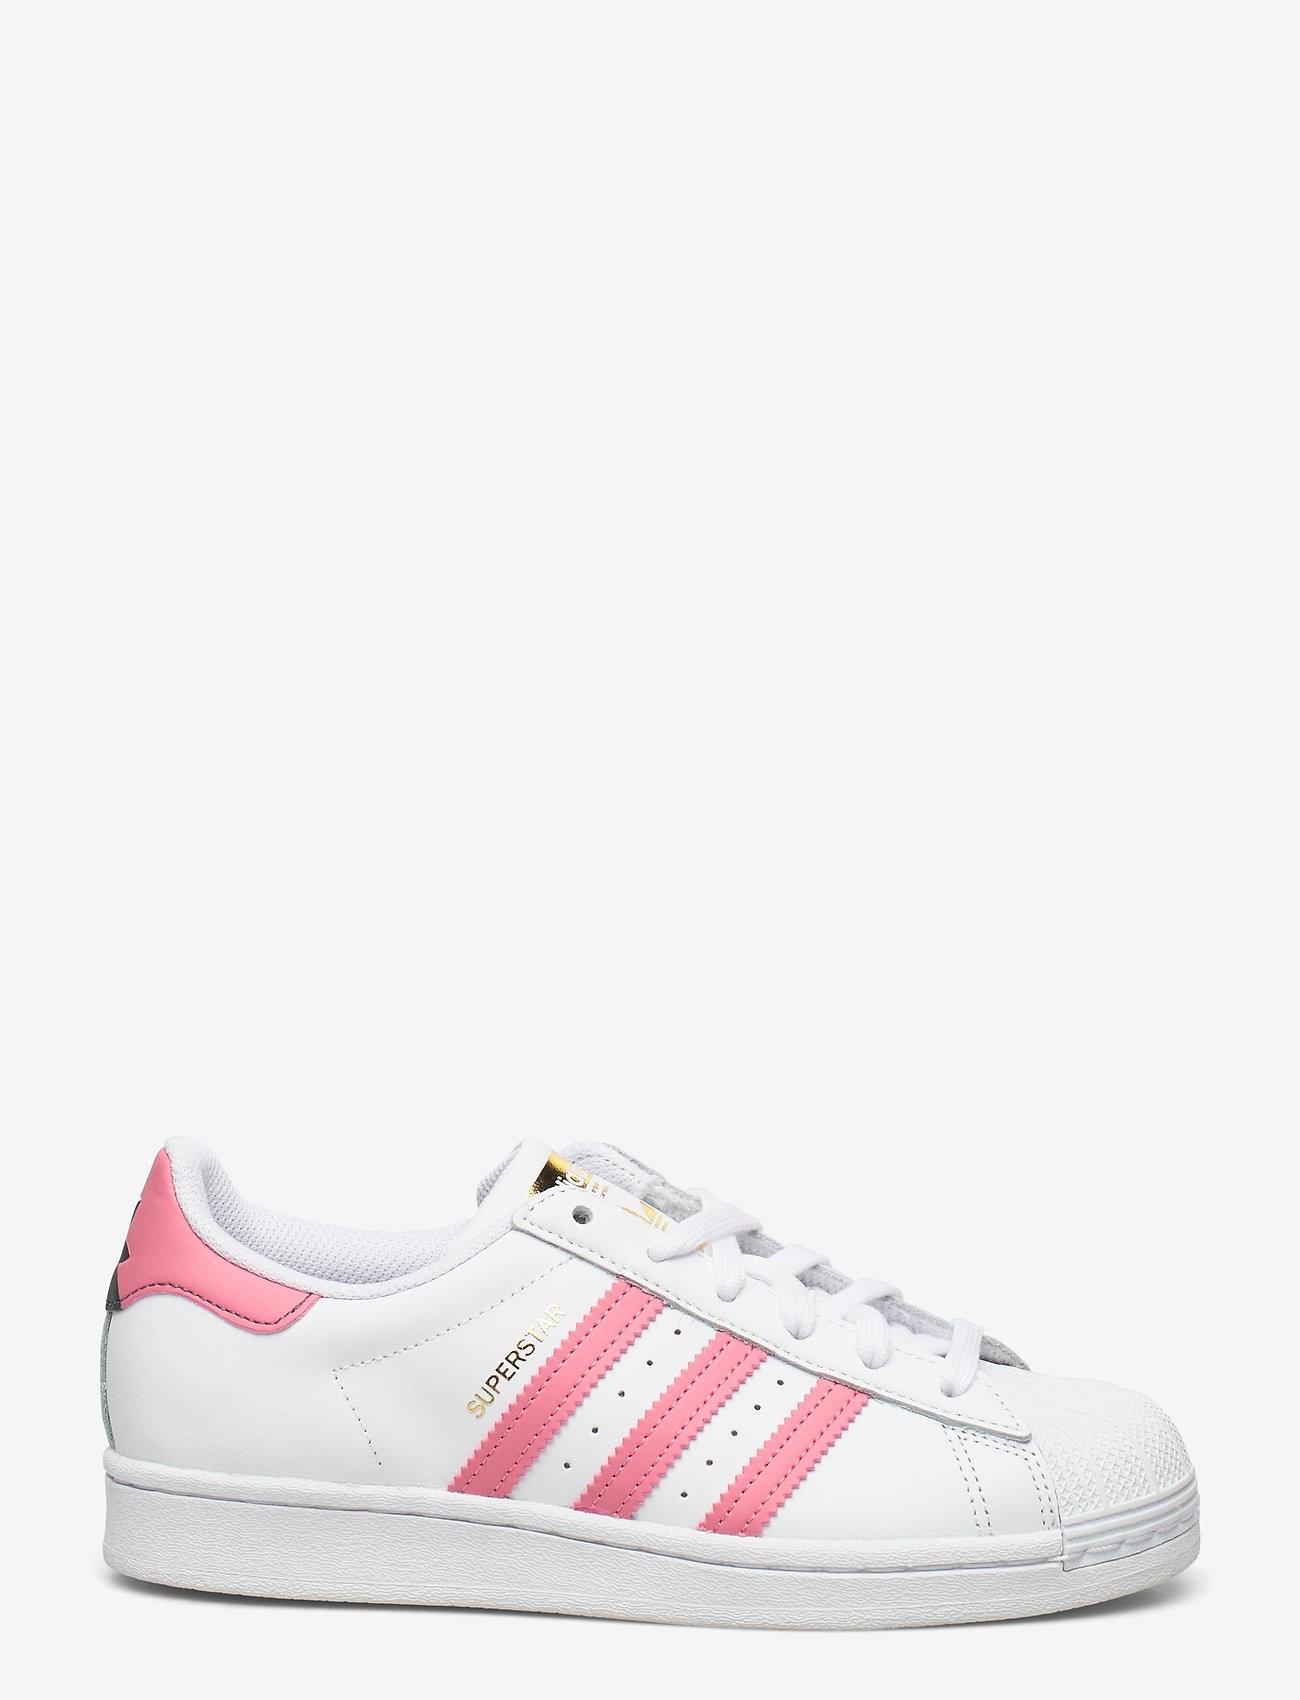 adidas Originals - Superstar W - low top sneakers - ftwwht/bluoxi/goldmt - 0